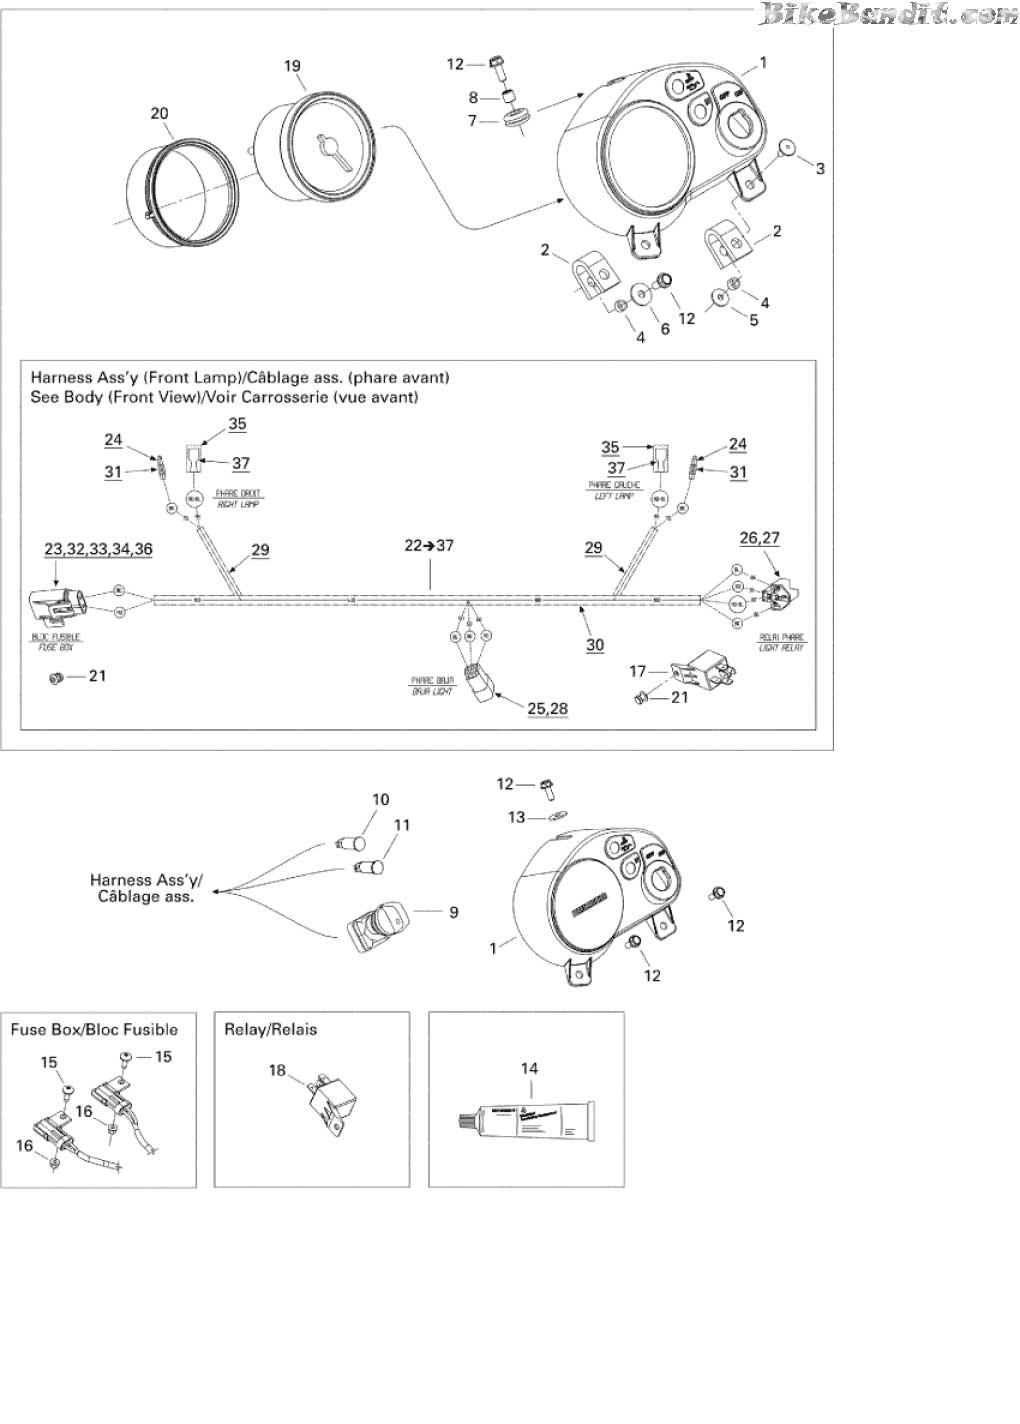 can am ds 650 wiring diagram best part of wiring diagramds 650 wiring diagram 2 sg dbd de \\u2022ds 650 wiring diagram online wiring diagram